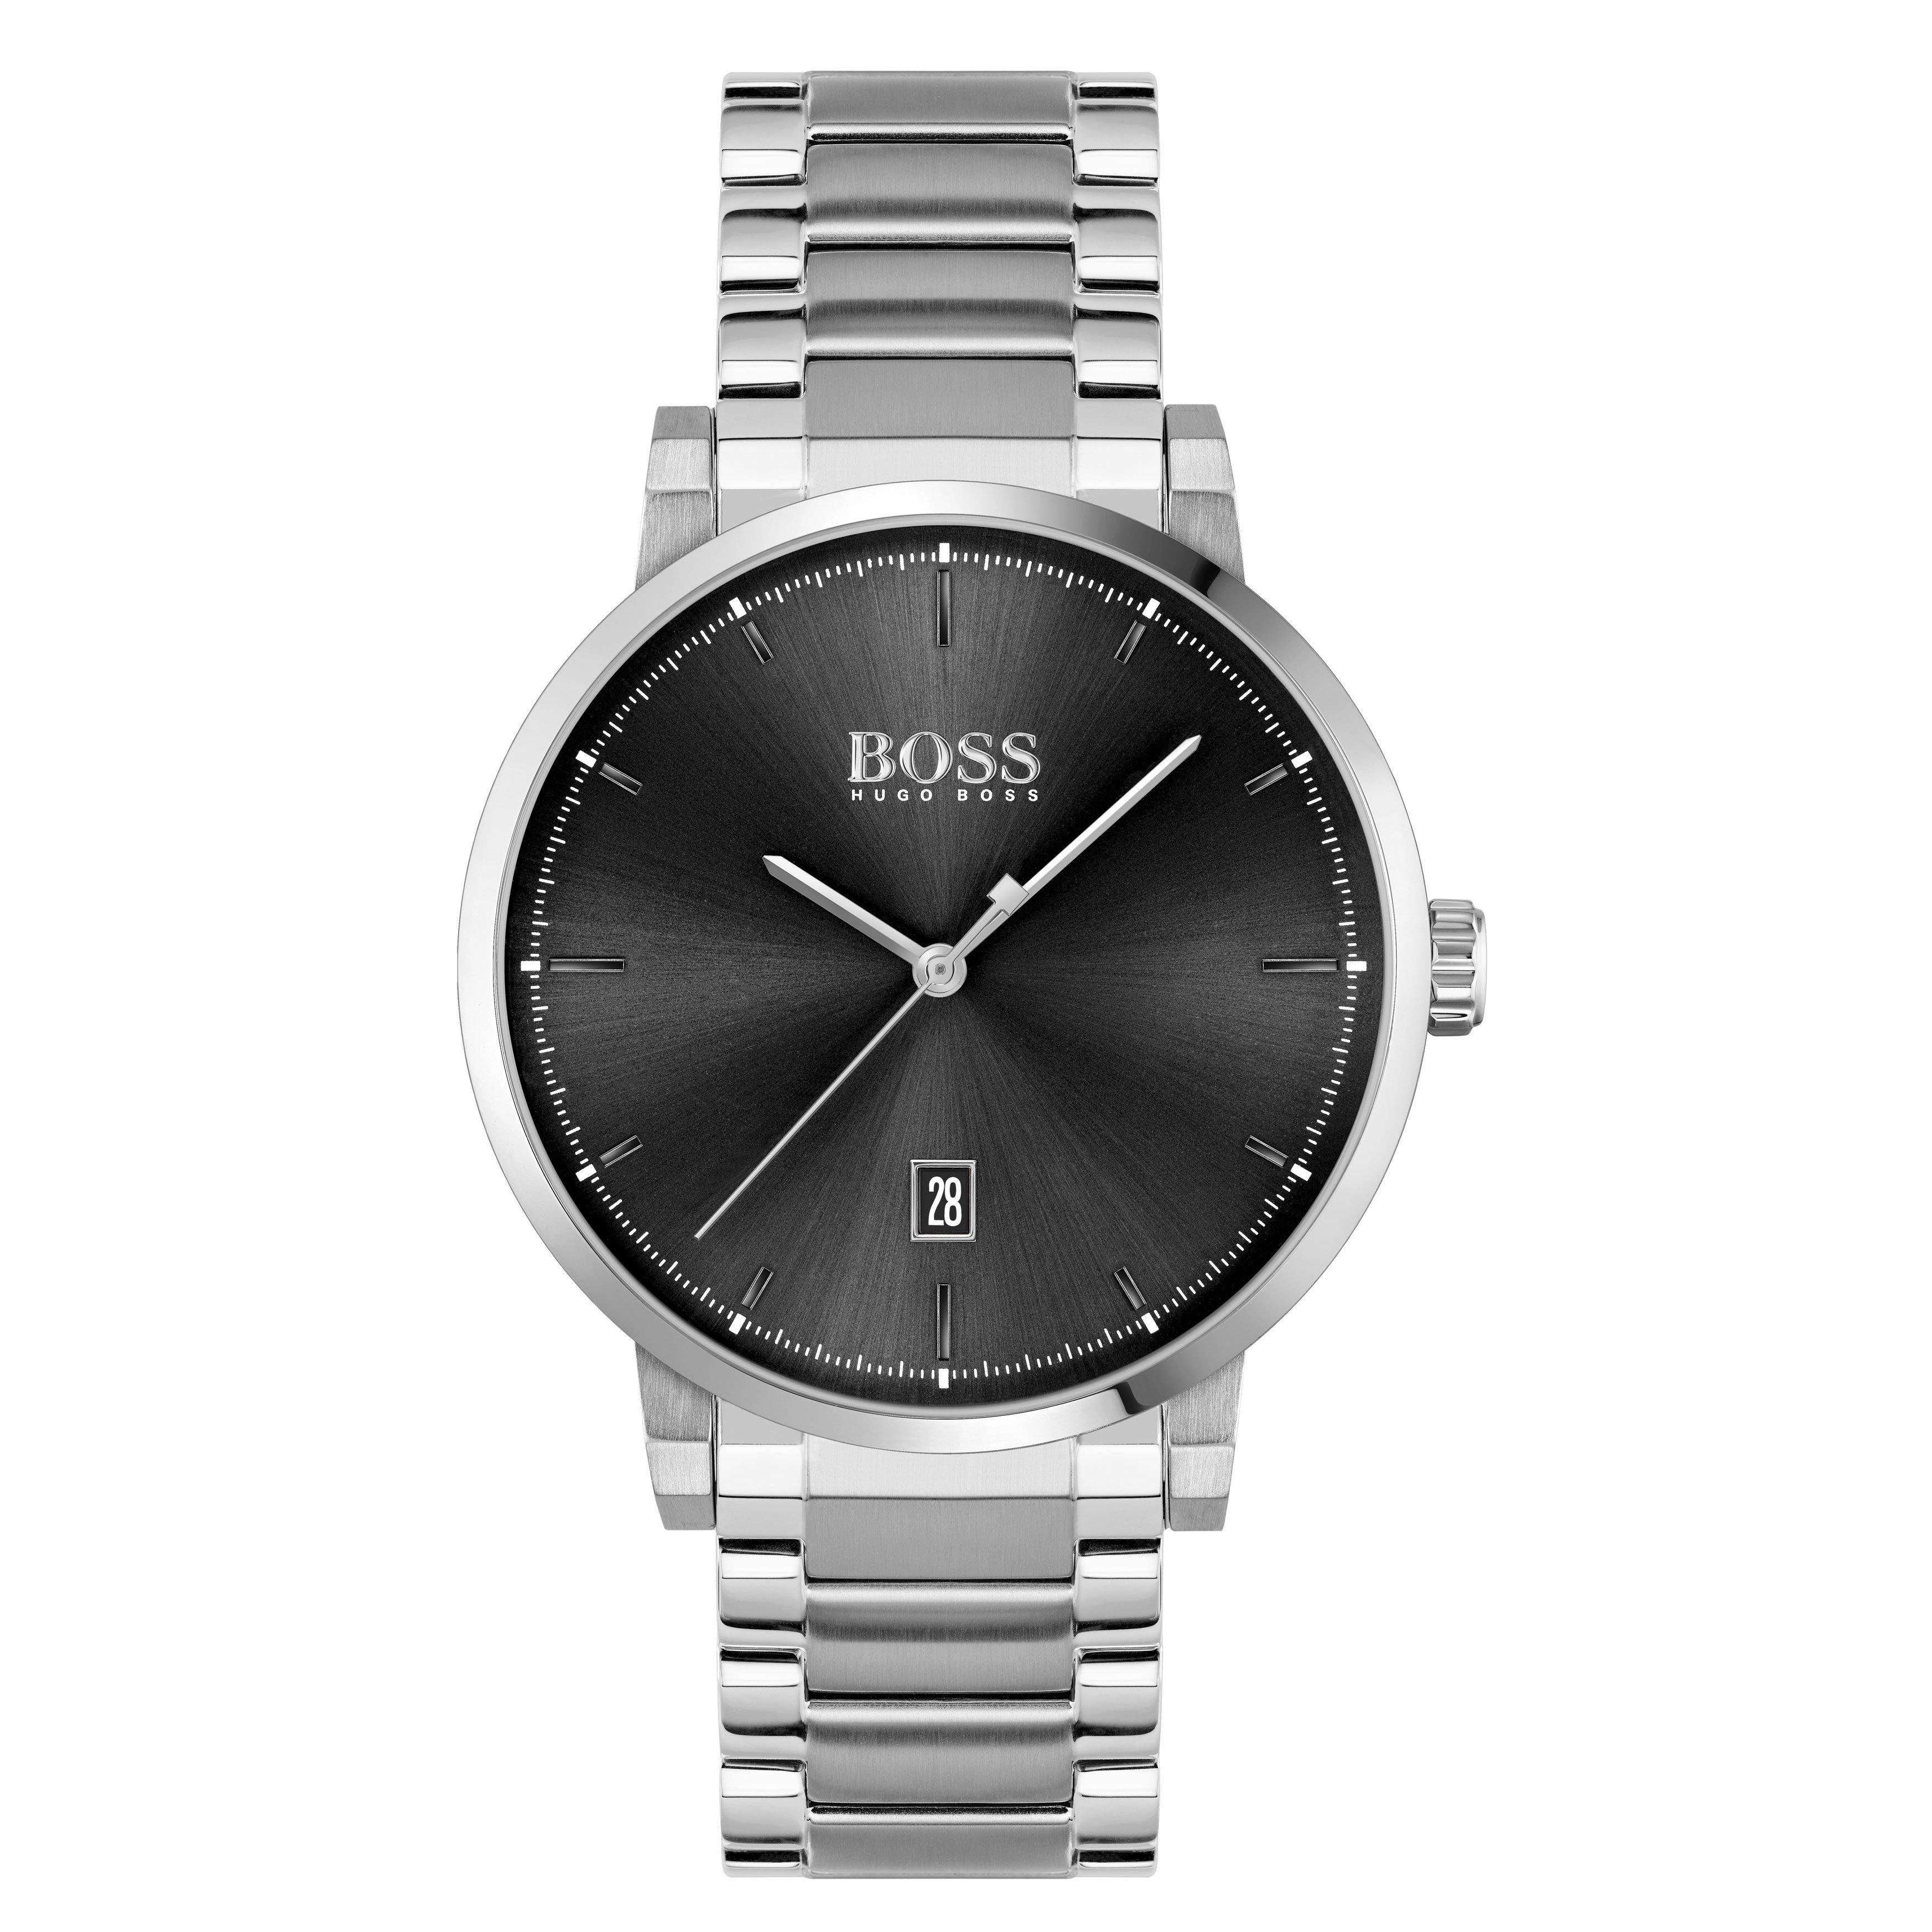 BOSS Confidence Men's Watch